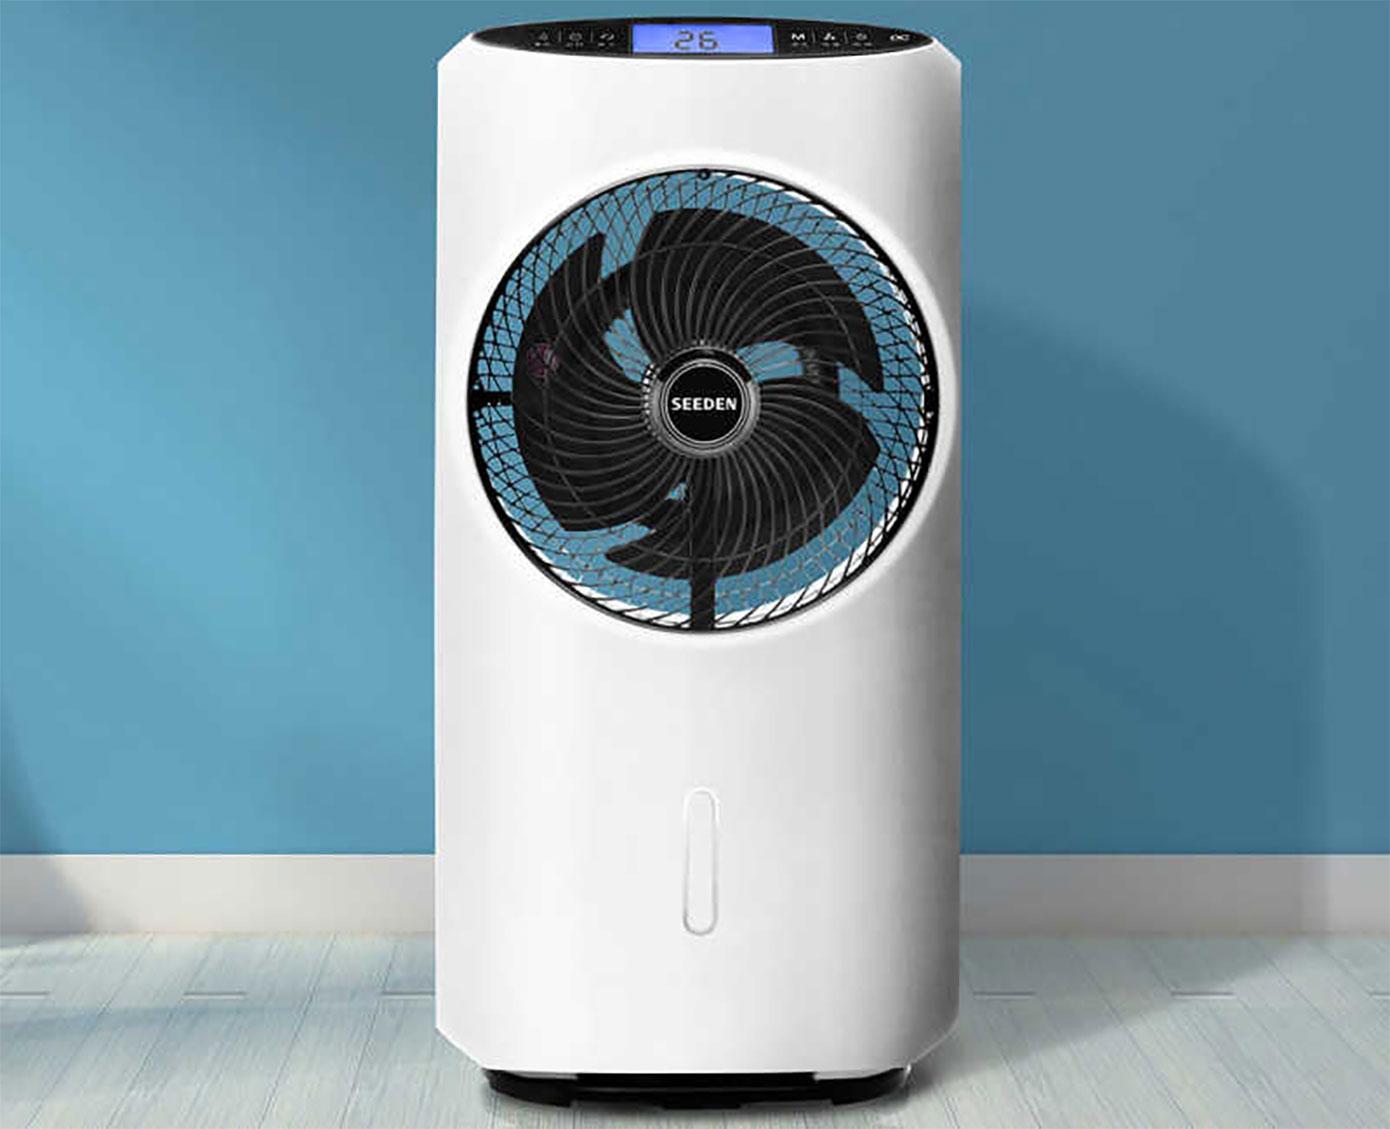 Opisanie Ventilyator S Uvlazhnitelem Vozduha Seeden Fog Type Cooling Fan 1s 4